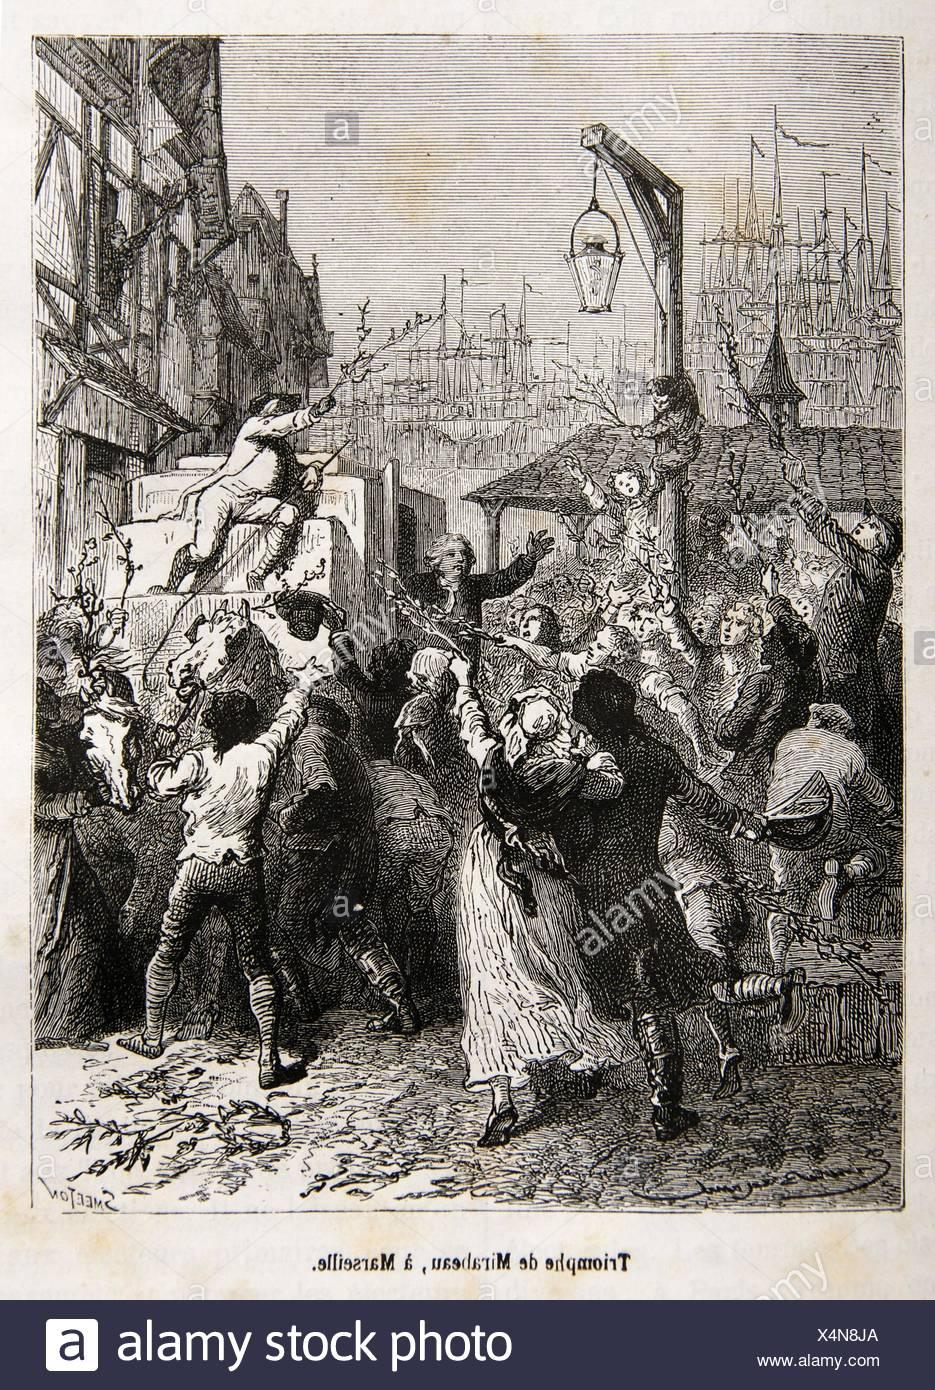 Triumph of Mirabeau, Marseille, France (18th century) - Stock Image